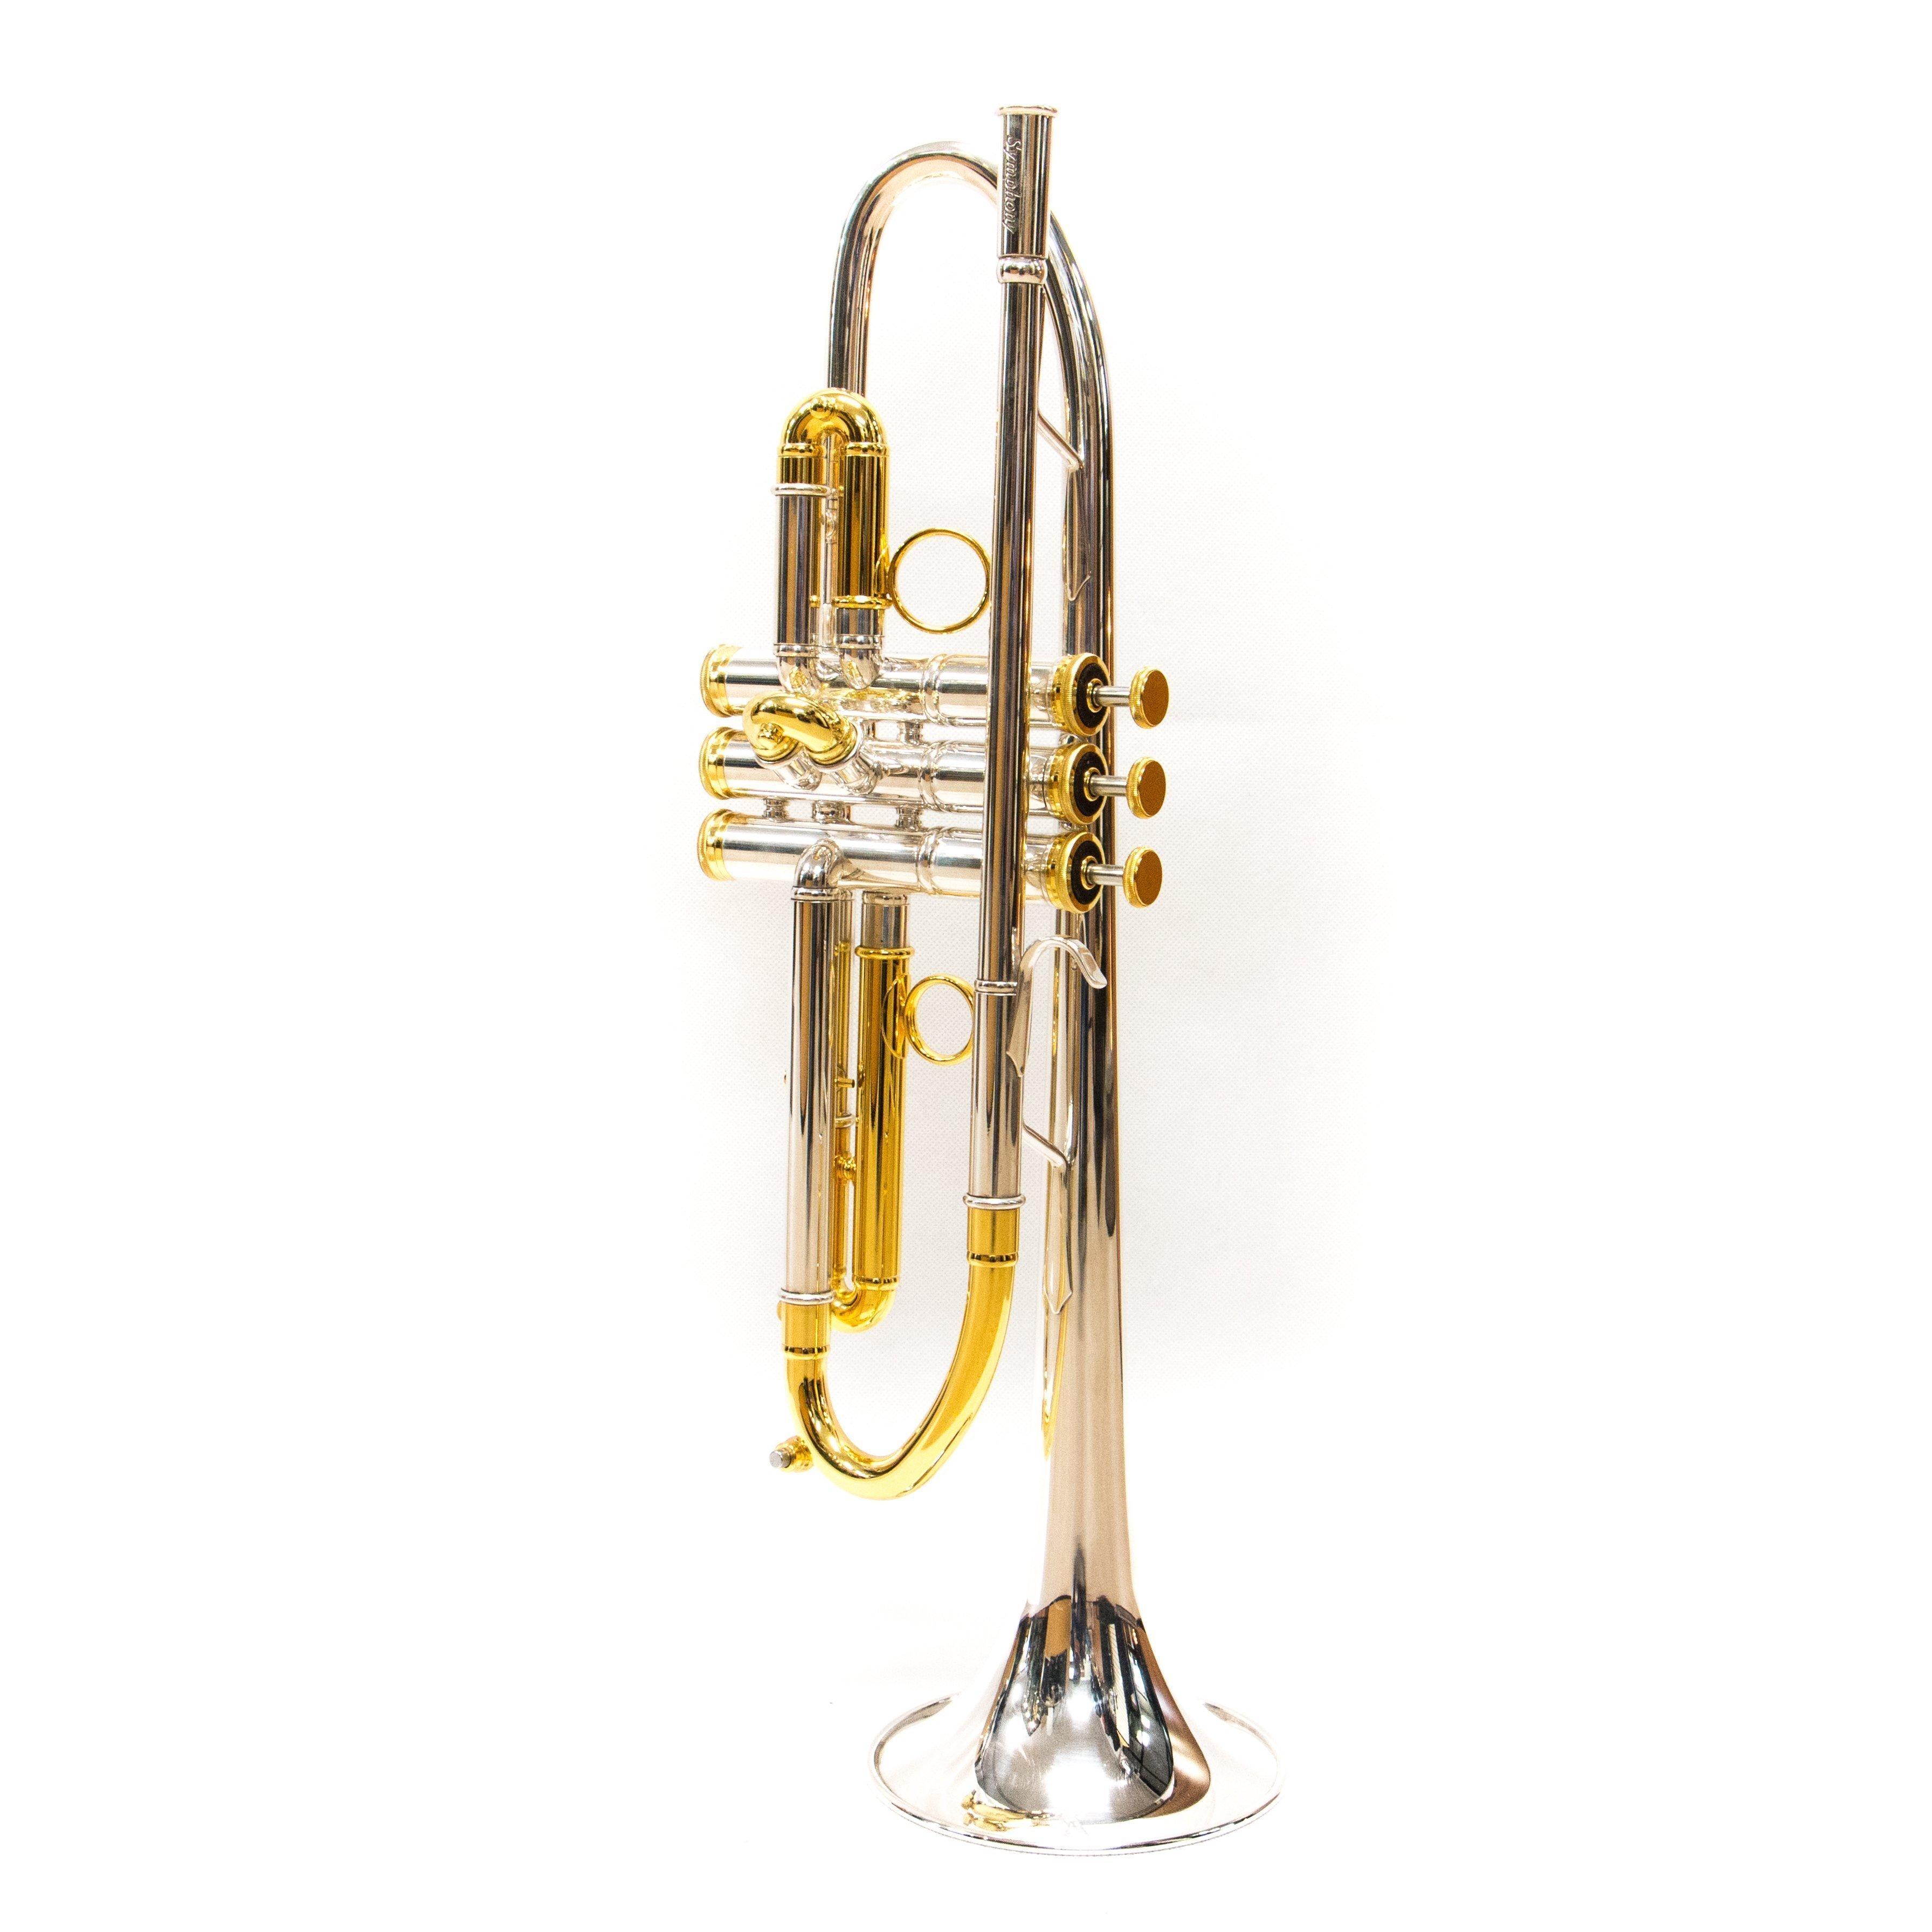 8000MLS-S/G tromba fides